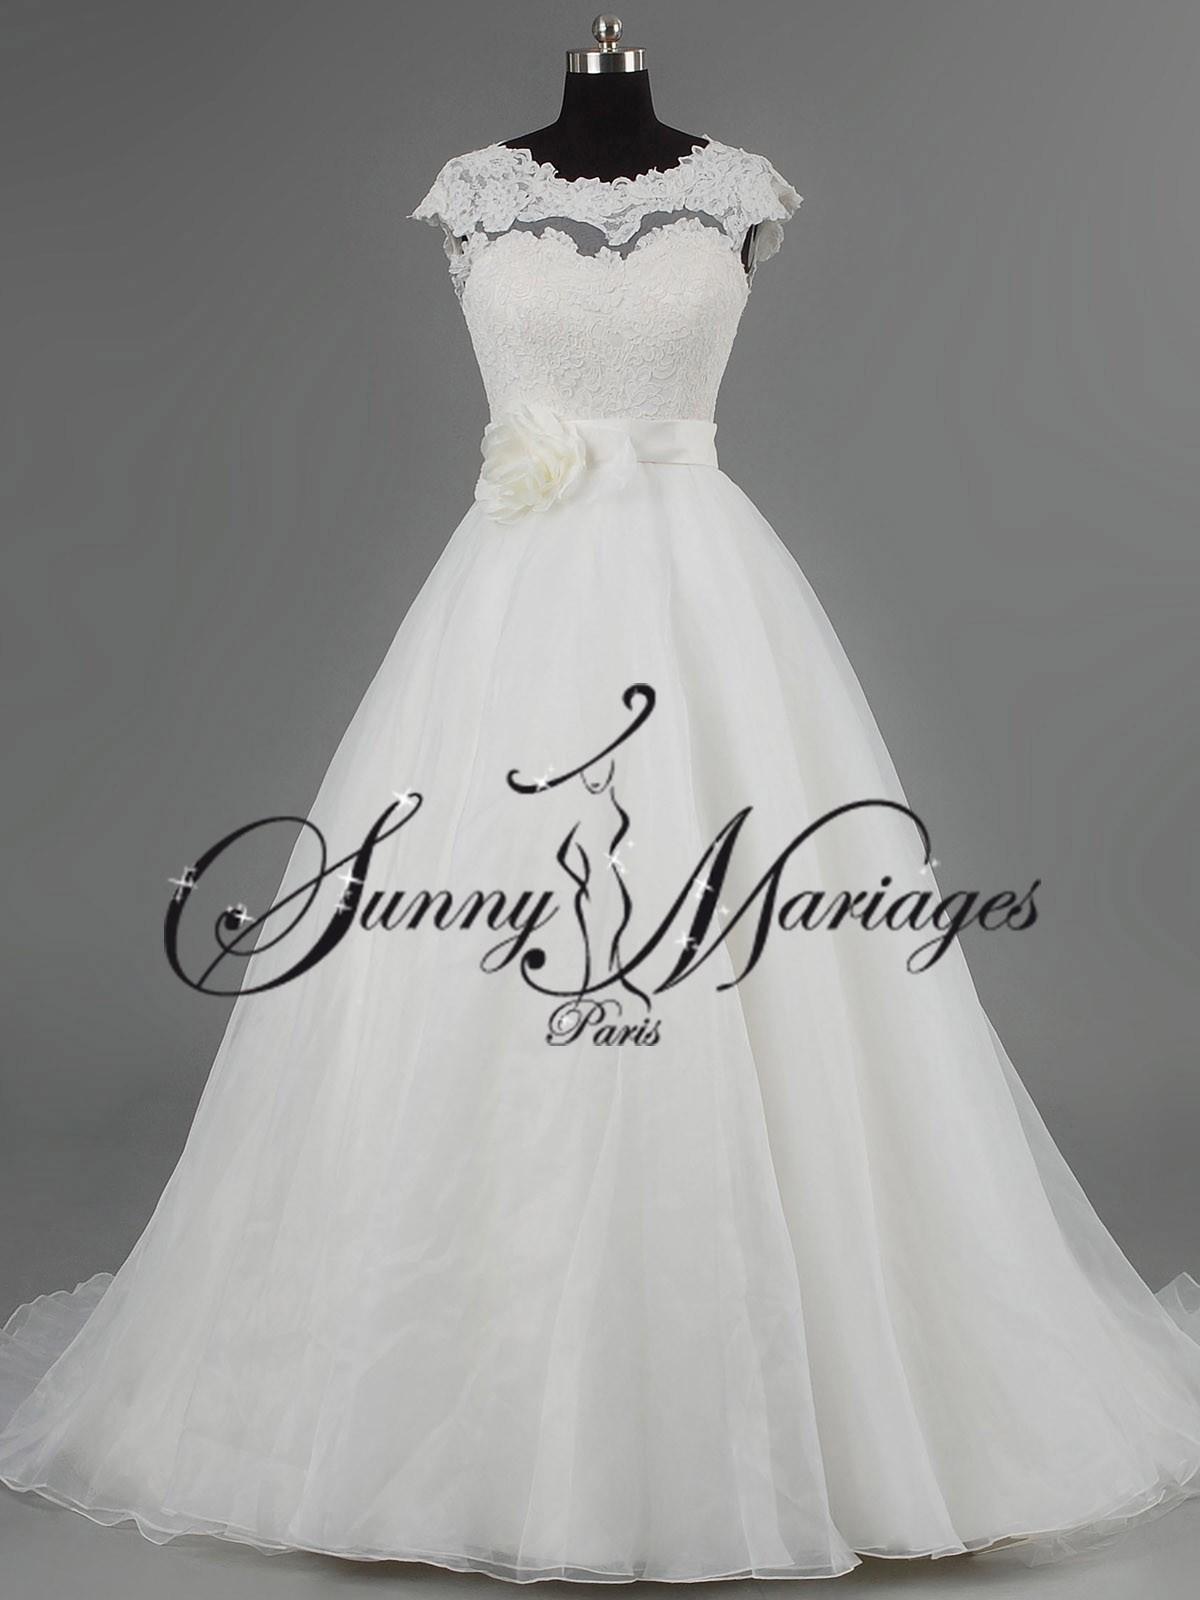 ... Mariage » robe de mariée » Robe de mariee princesse « Lucille